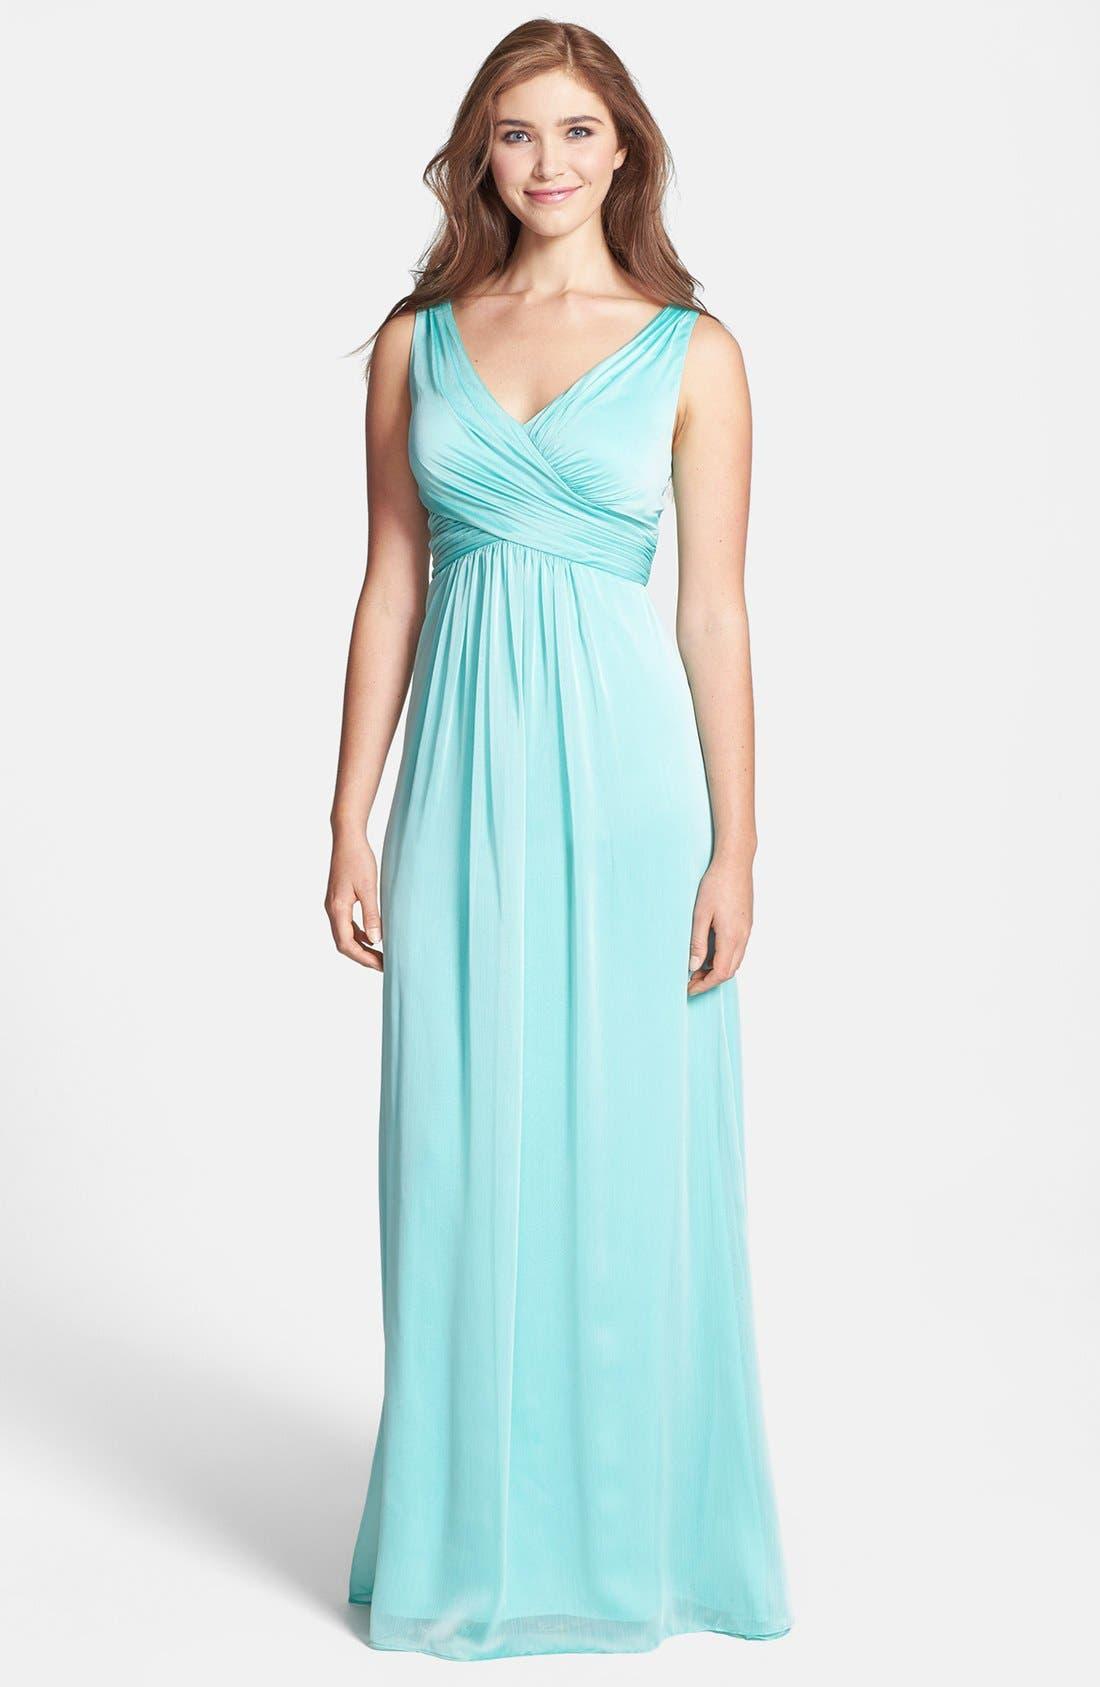 Alternate Image 1 Selected - Adrianna Papell Crisscross Chiffon Dress